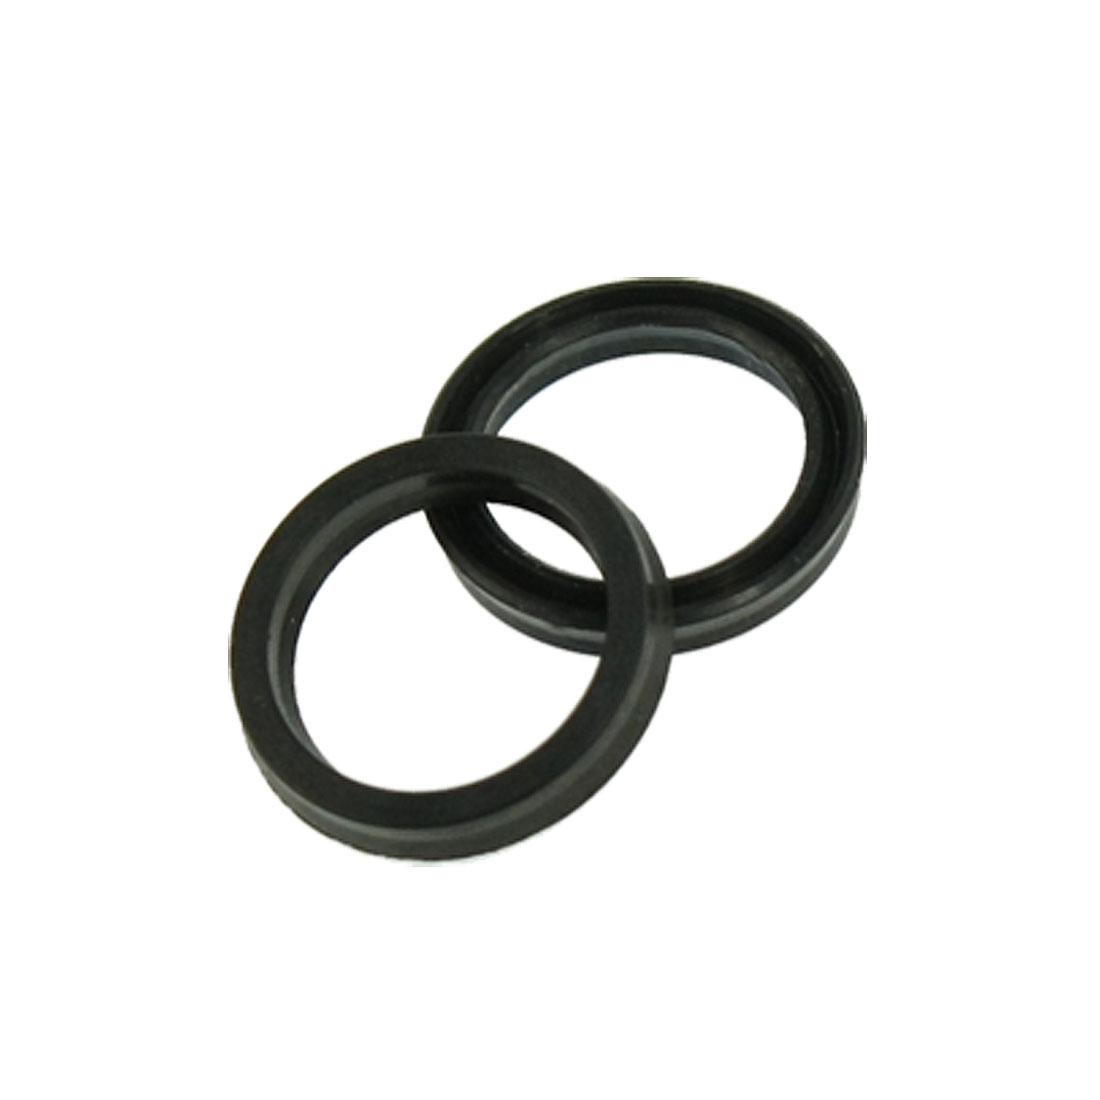 2 Pcs 14mm Inner Diameter Pneumatic Air Sealing Rings Rubber Gaskets